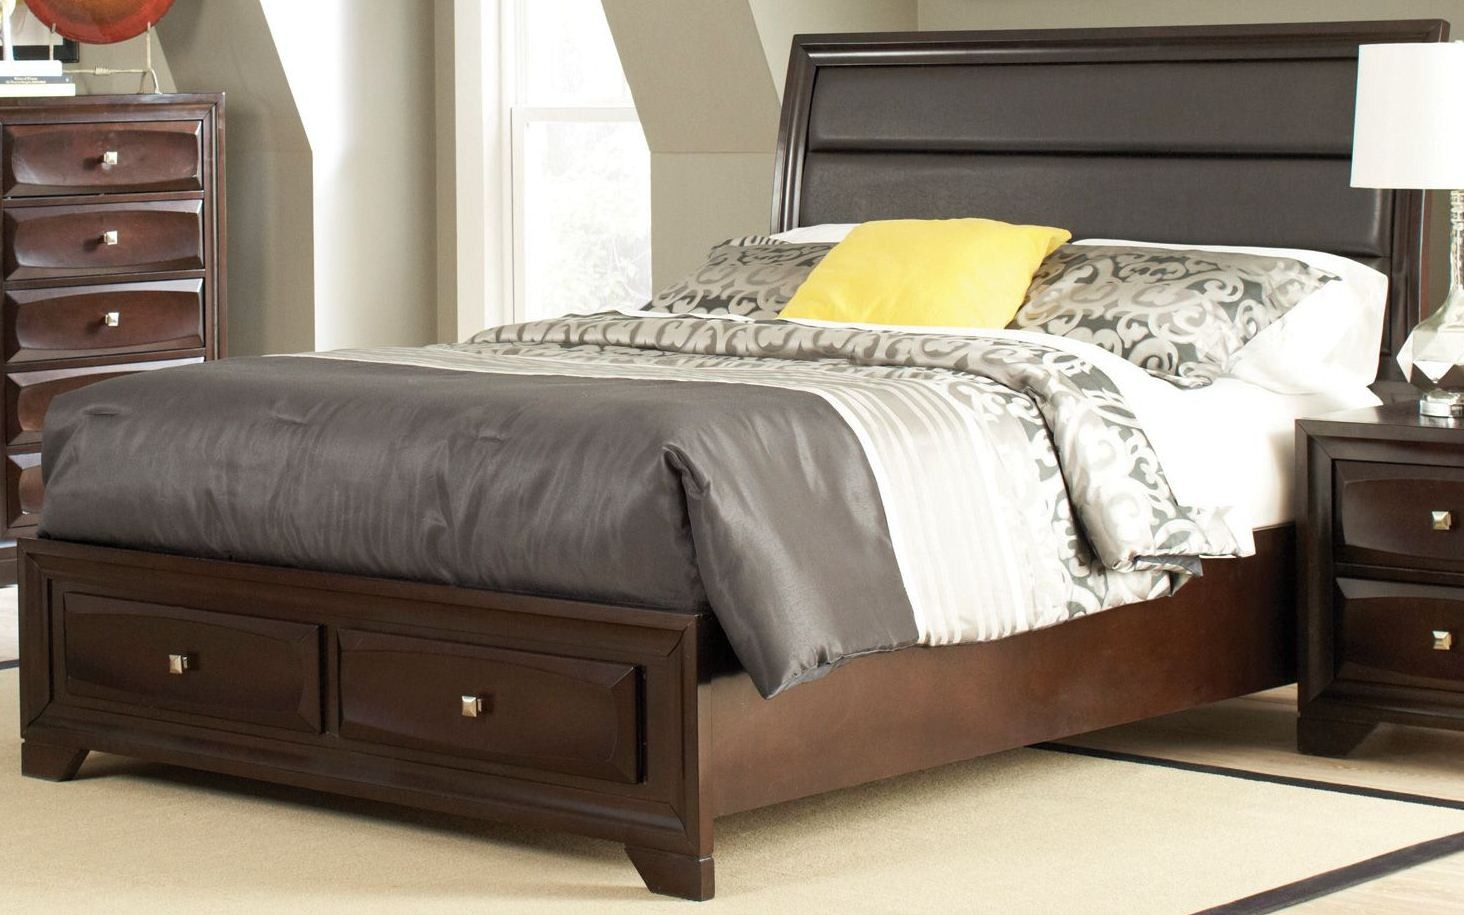 Jaxson King Storage Platform Bed From Coaster (203481KE